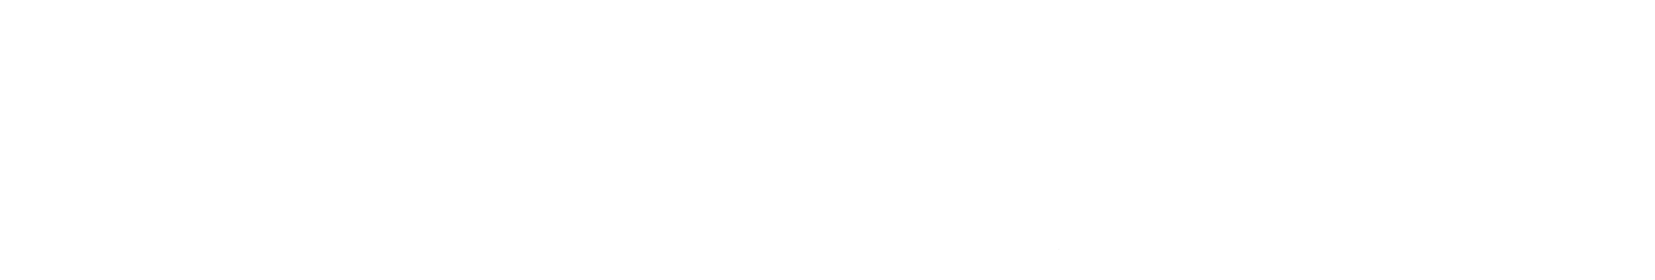 firetrace - Client Logo-1